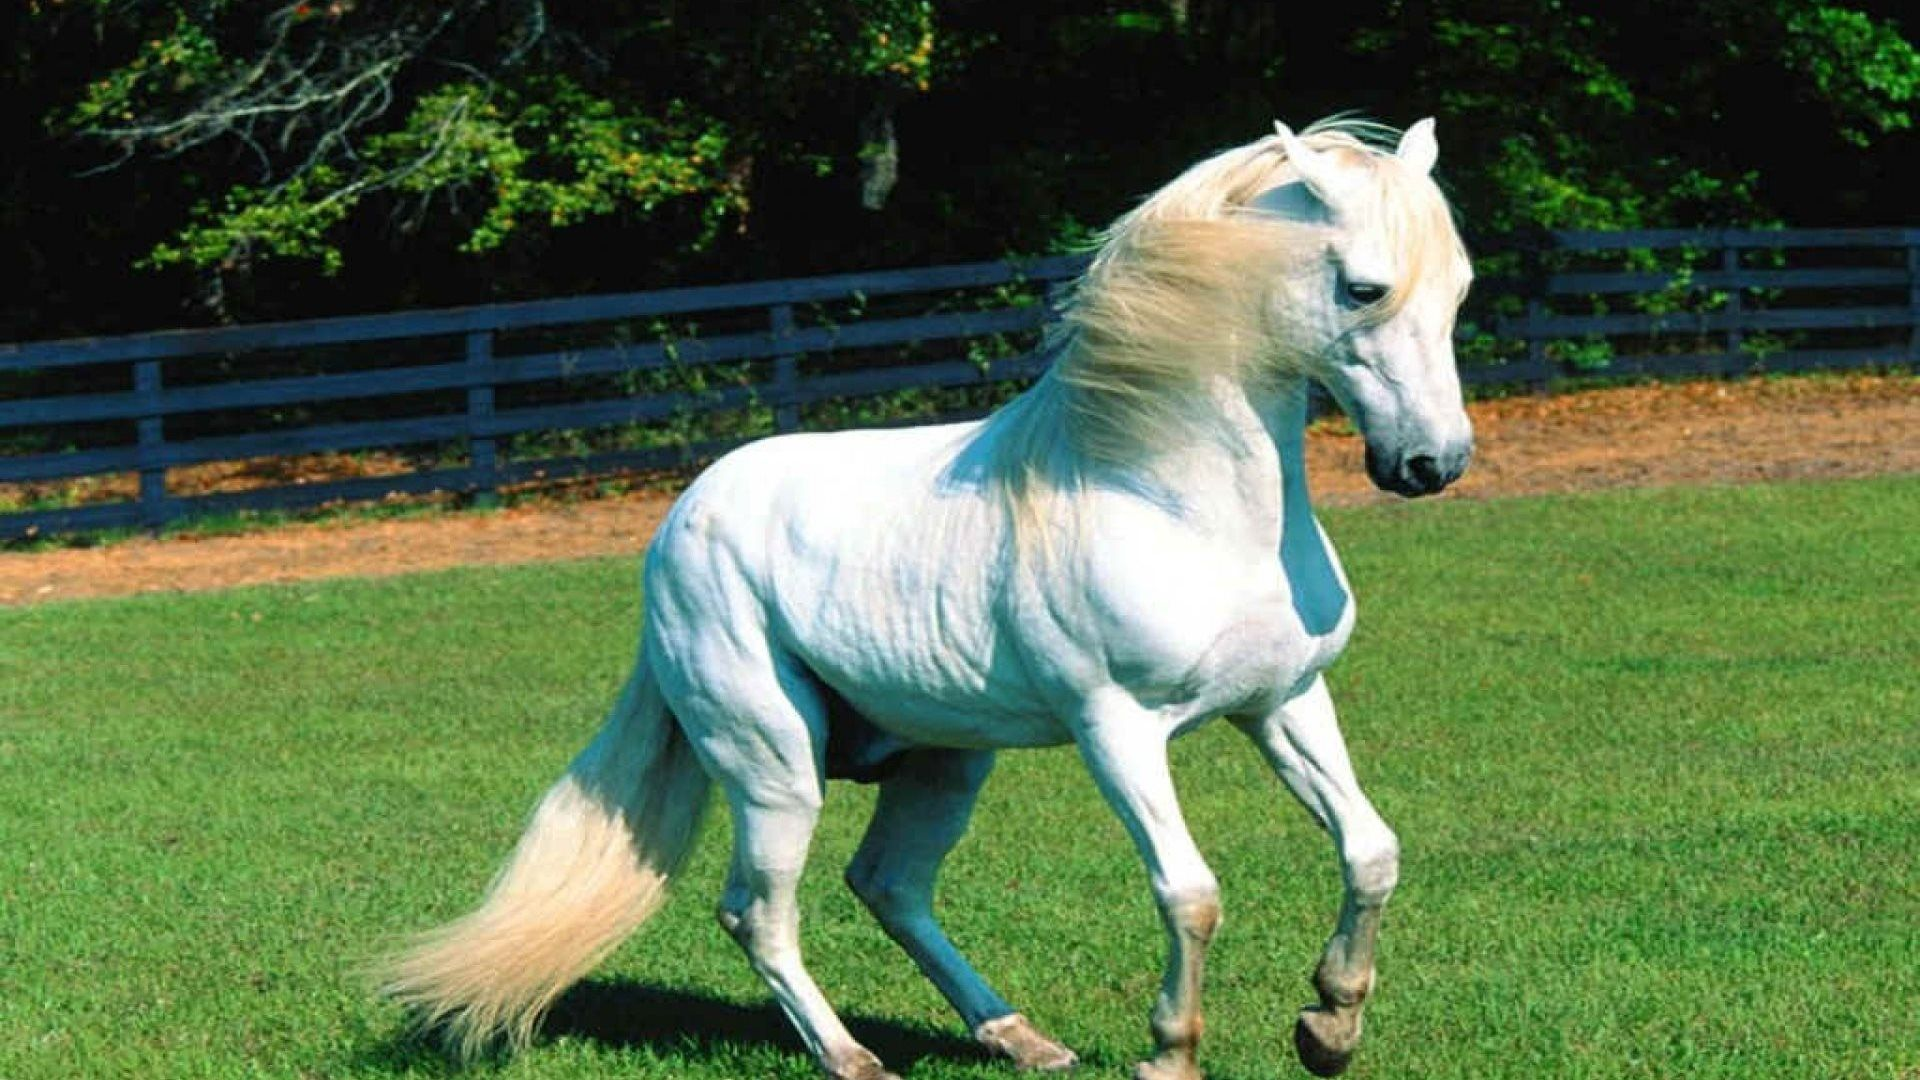 Real Unicorn Wallpapers - Top Free Real Unicorn ...